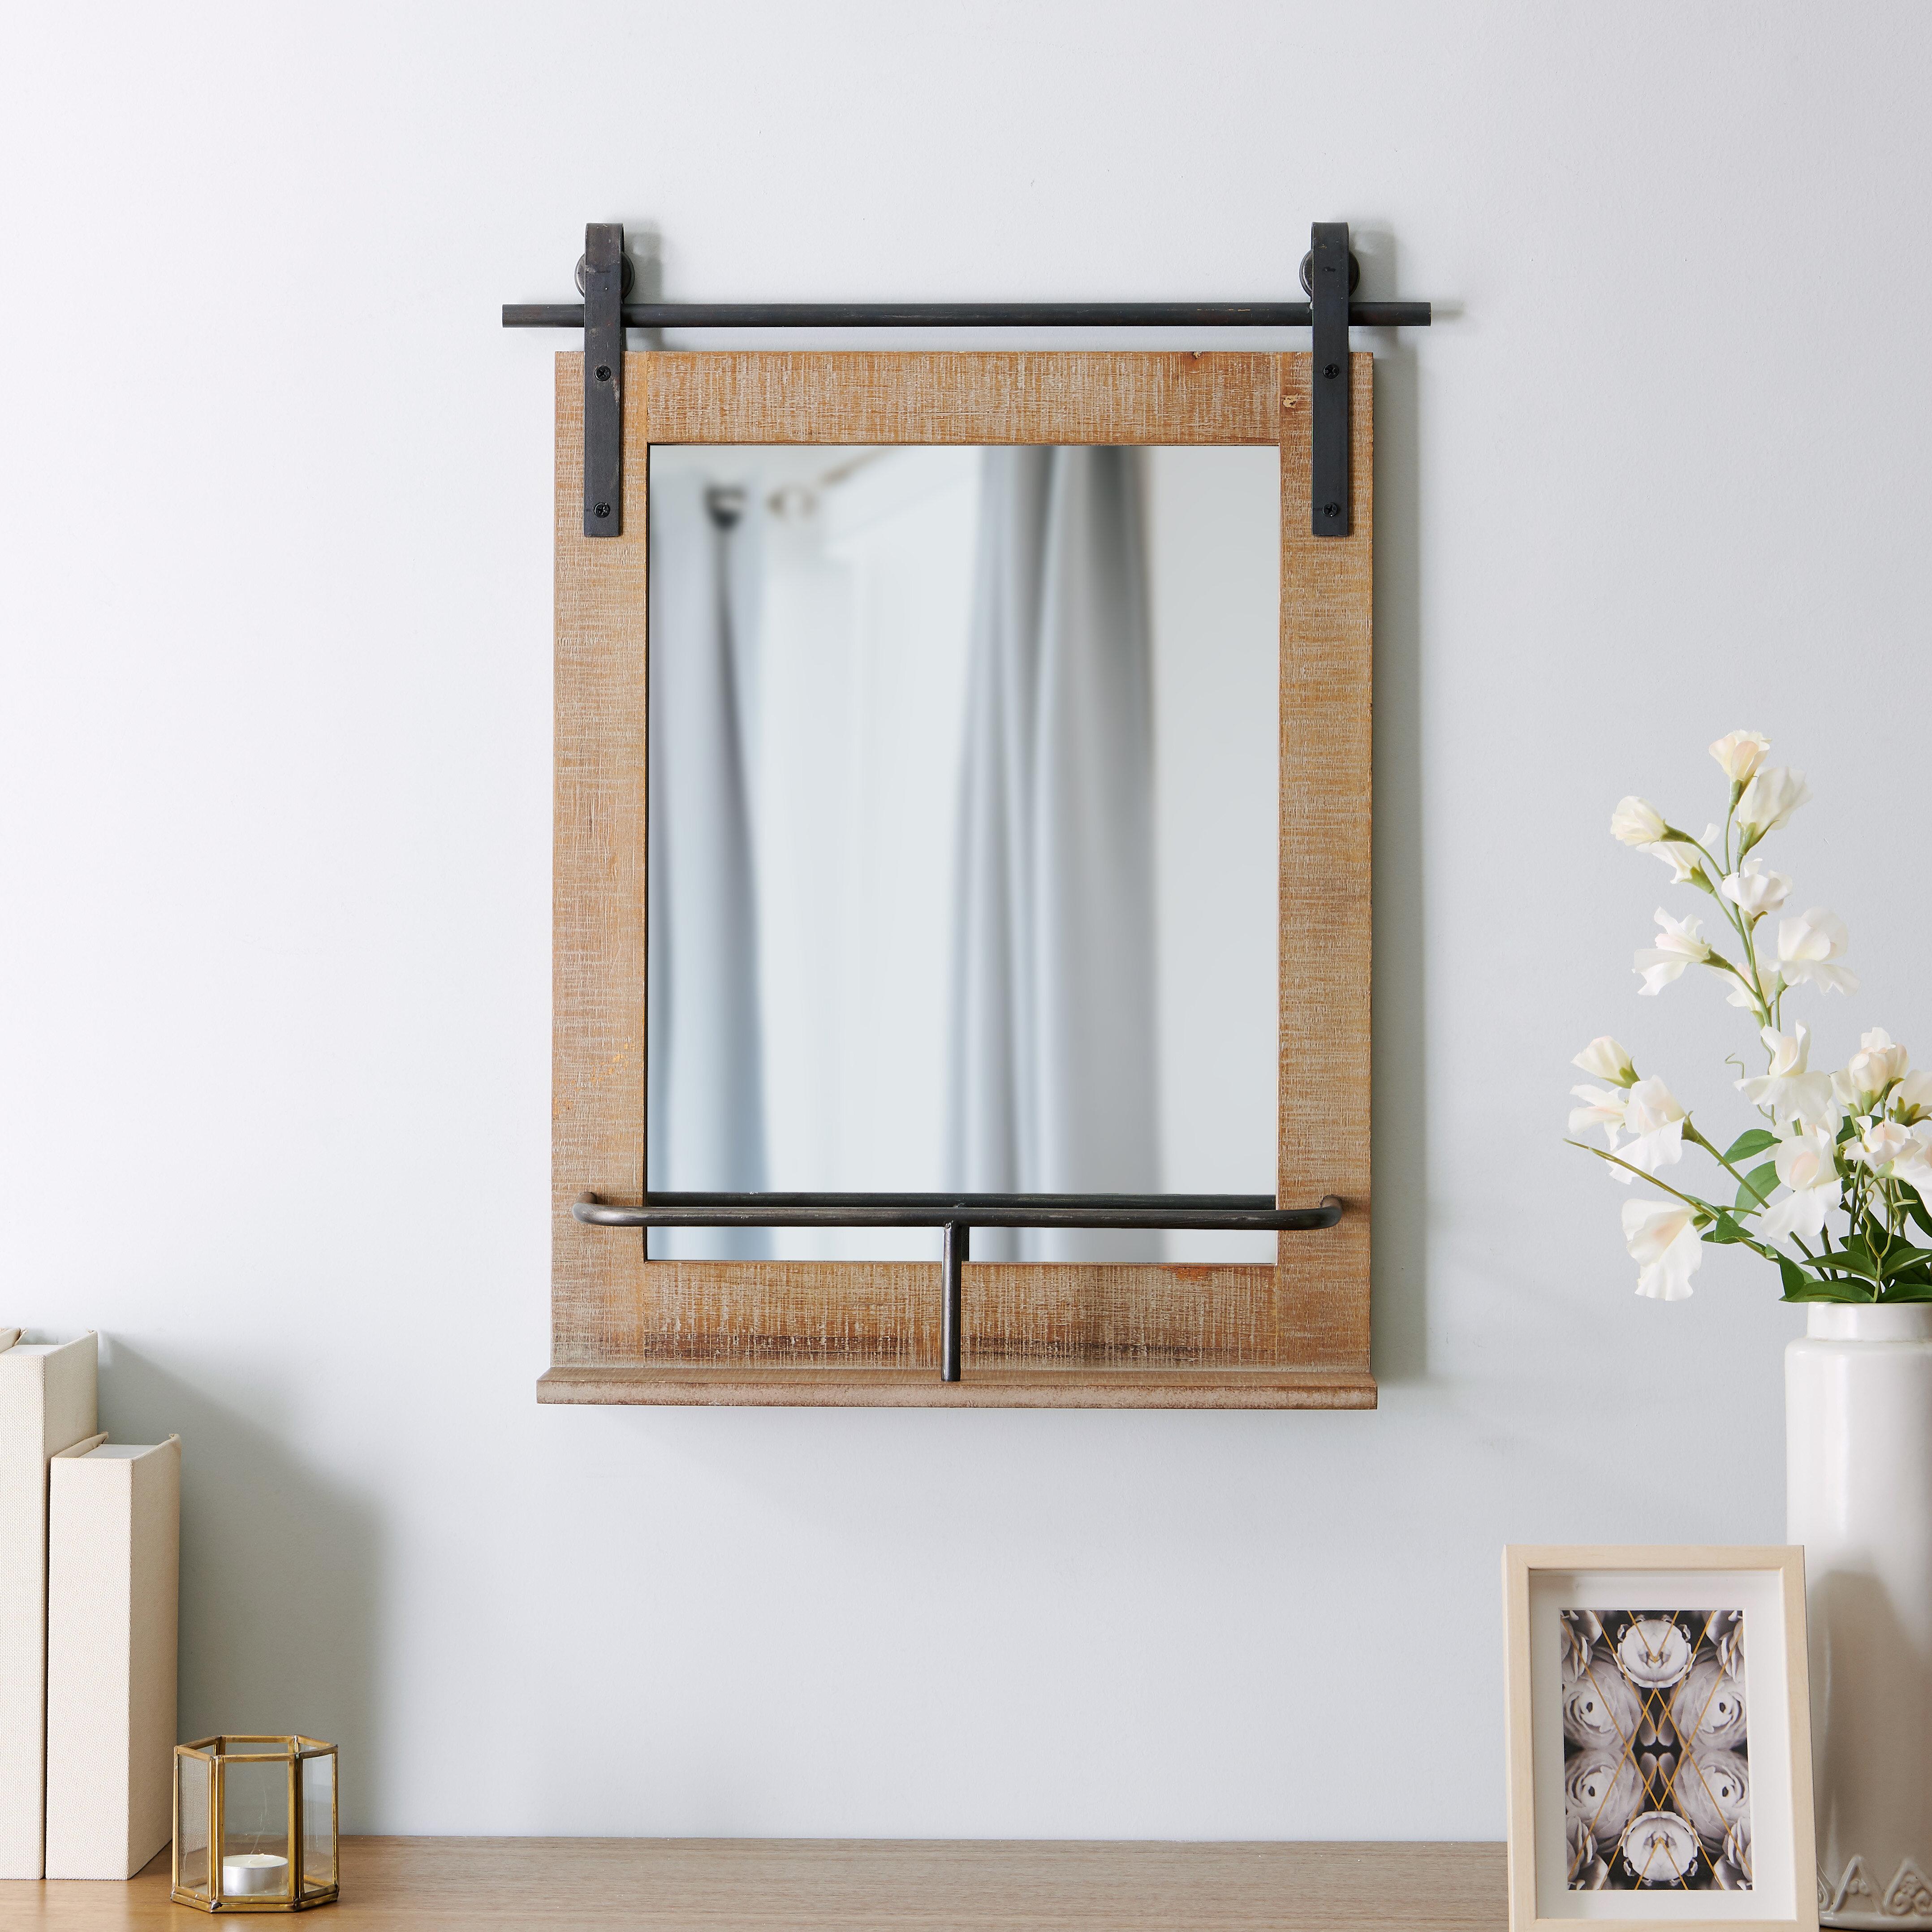 Nielsen Barn Door Rustic Shelves Accent Mirror With Rena Accent Mirrors (View 5 of 20)